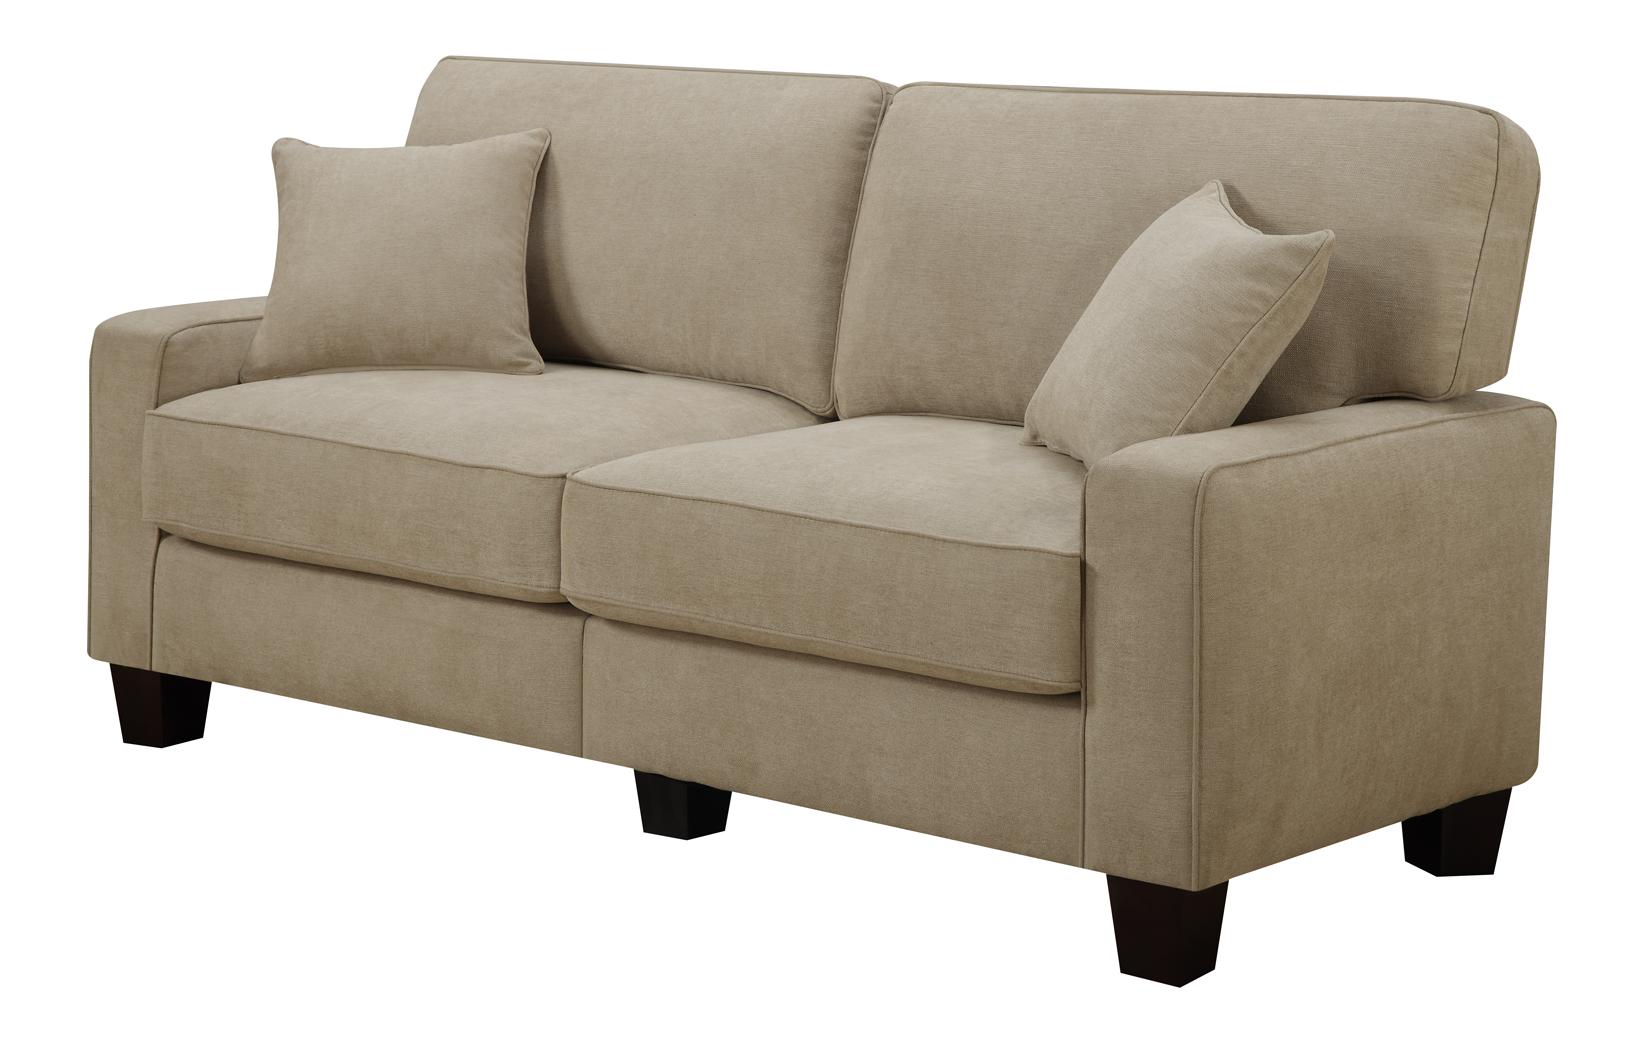 "73"" Serta Navarre Collection Sofa (Beige)  $201 + Free Shipping"